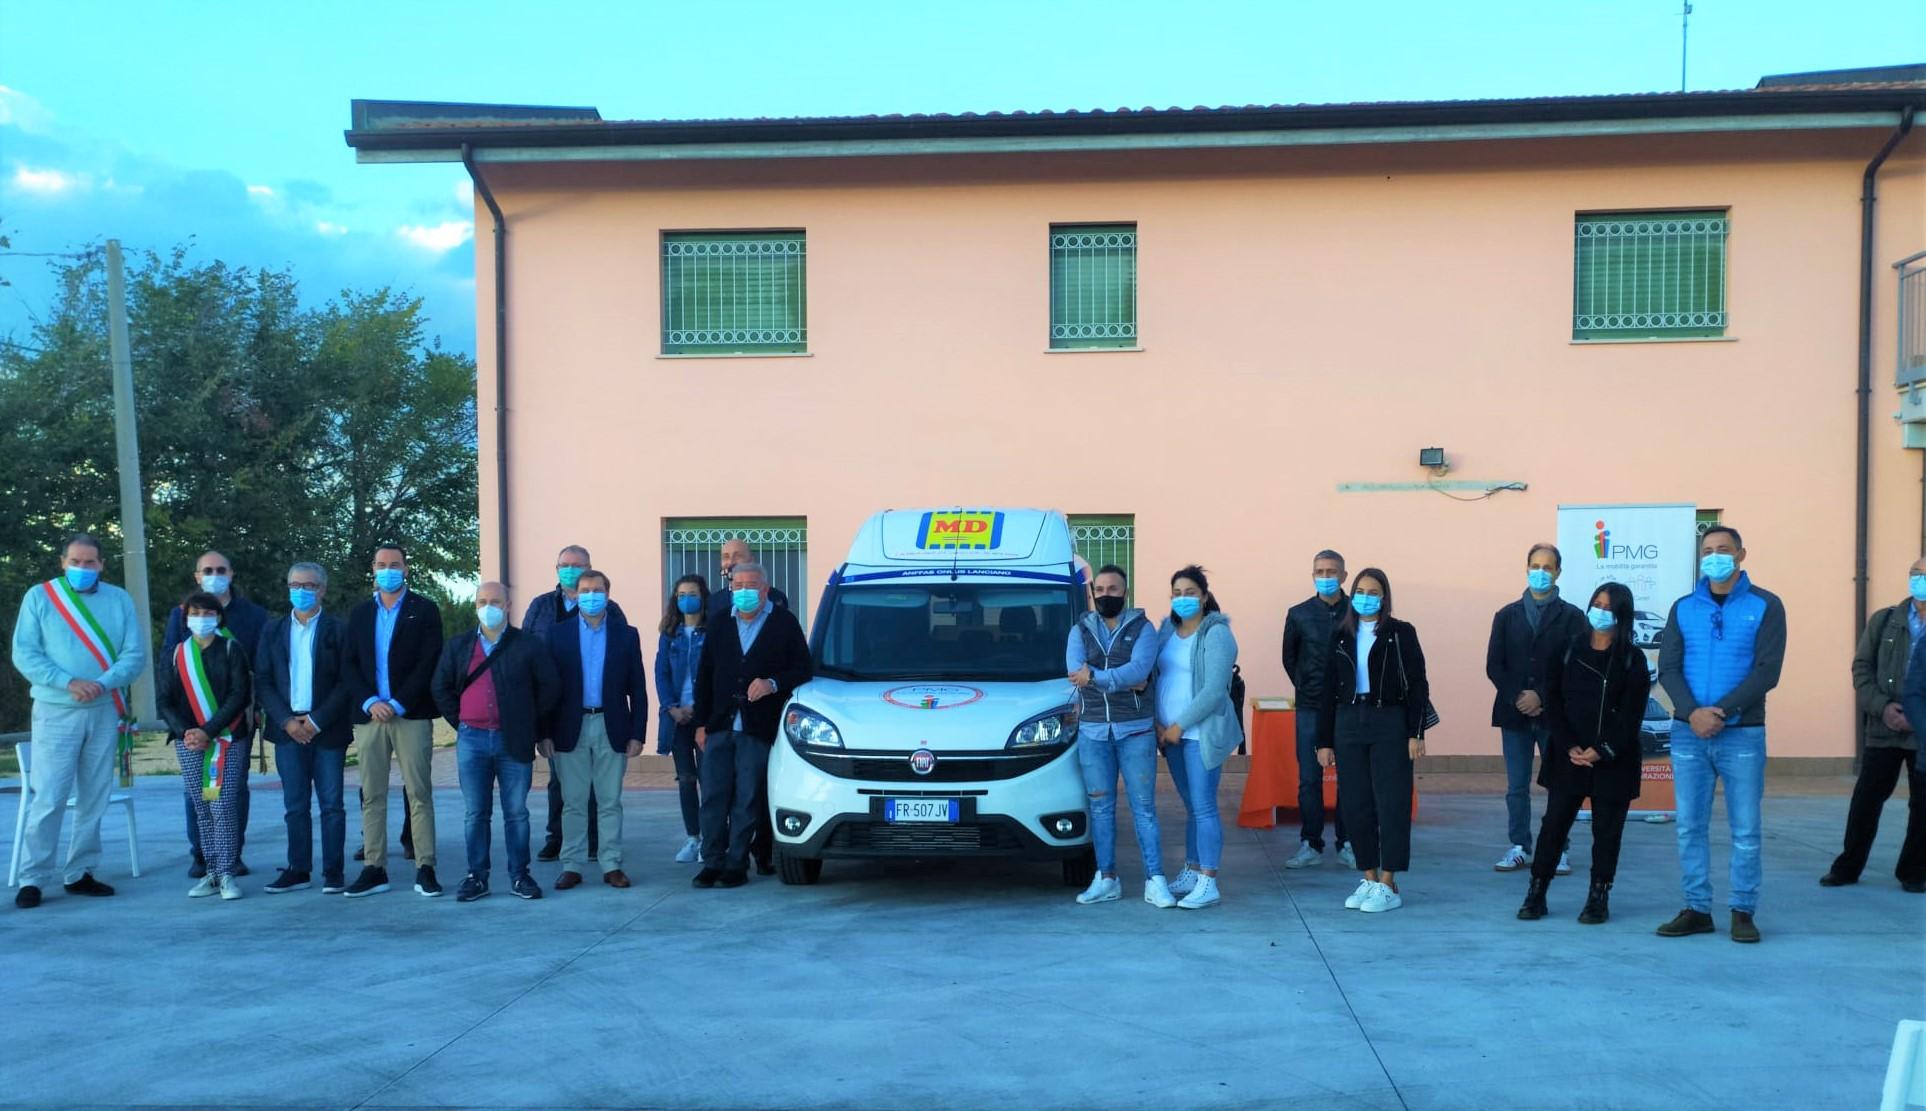 PMG Italia e Anffas - Gruppo